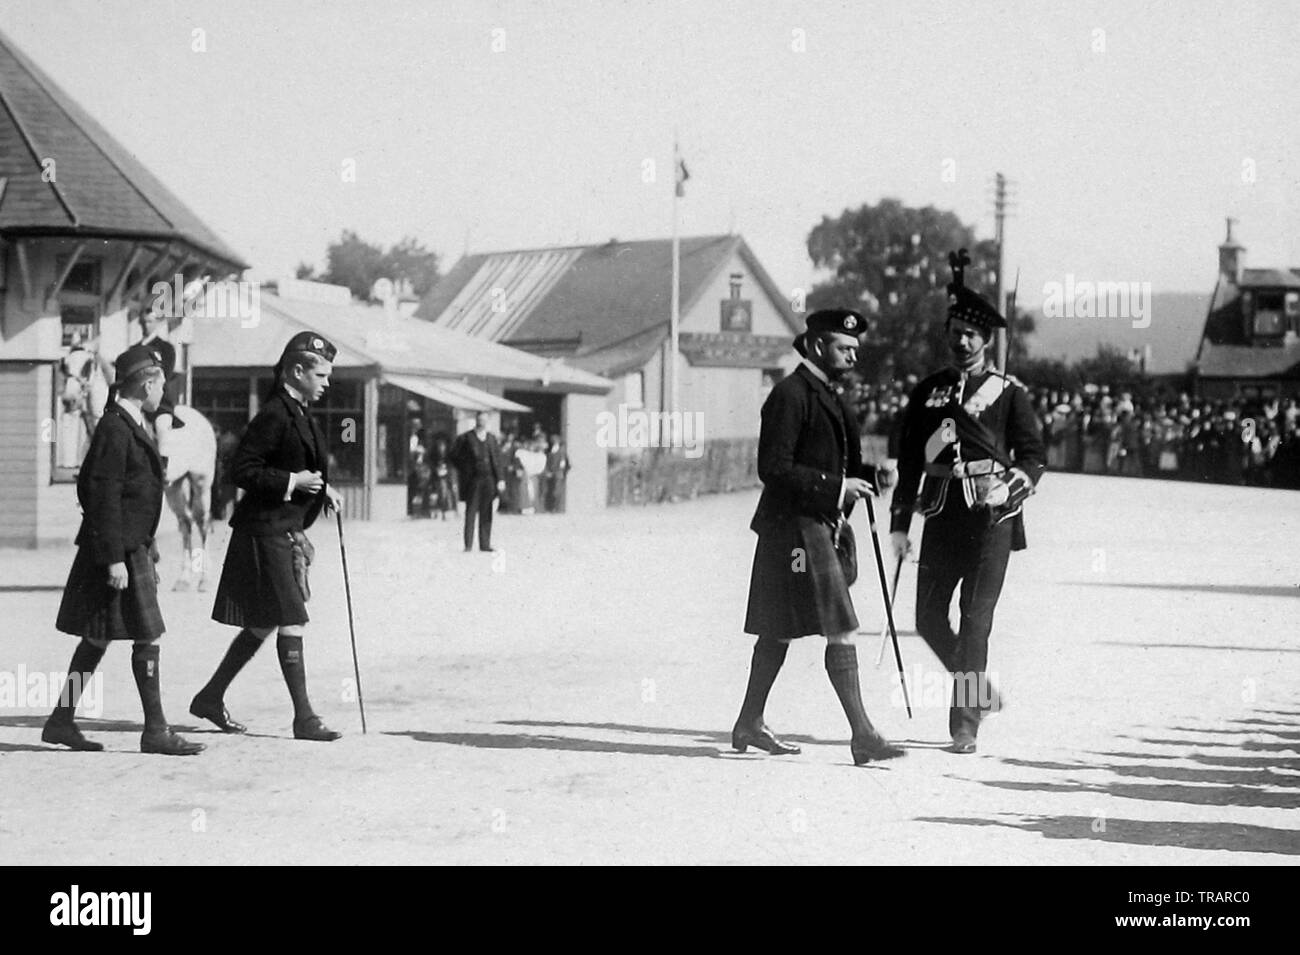 King George V, Prince of Wales and Prince Albert - Stock Image